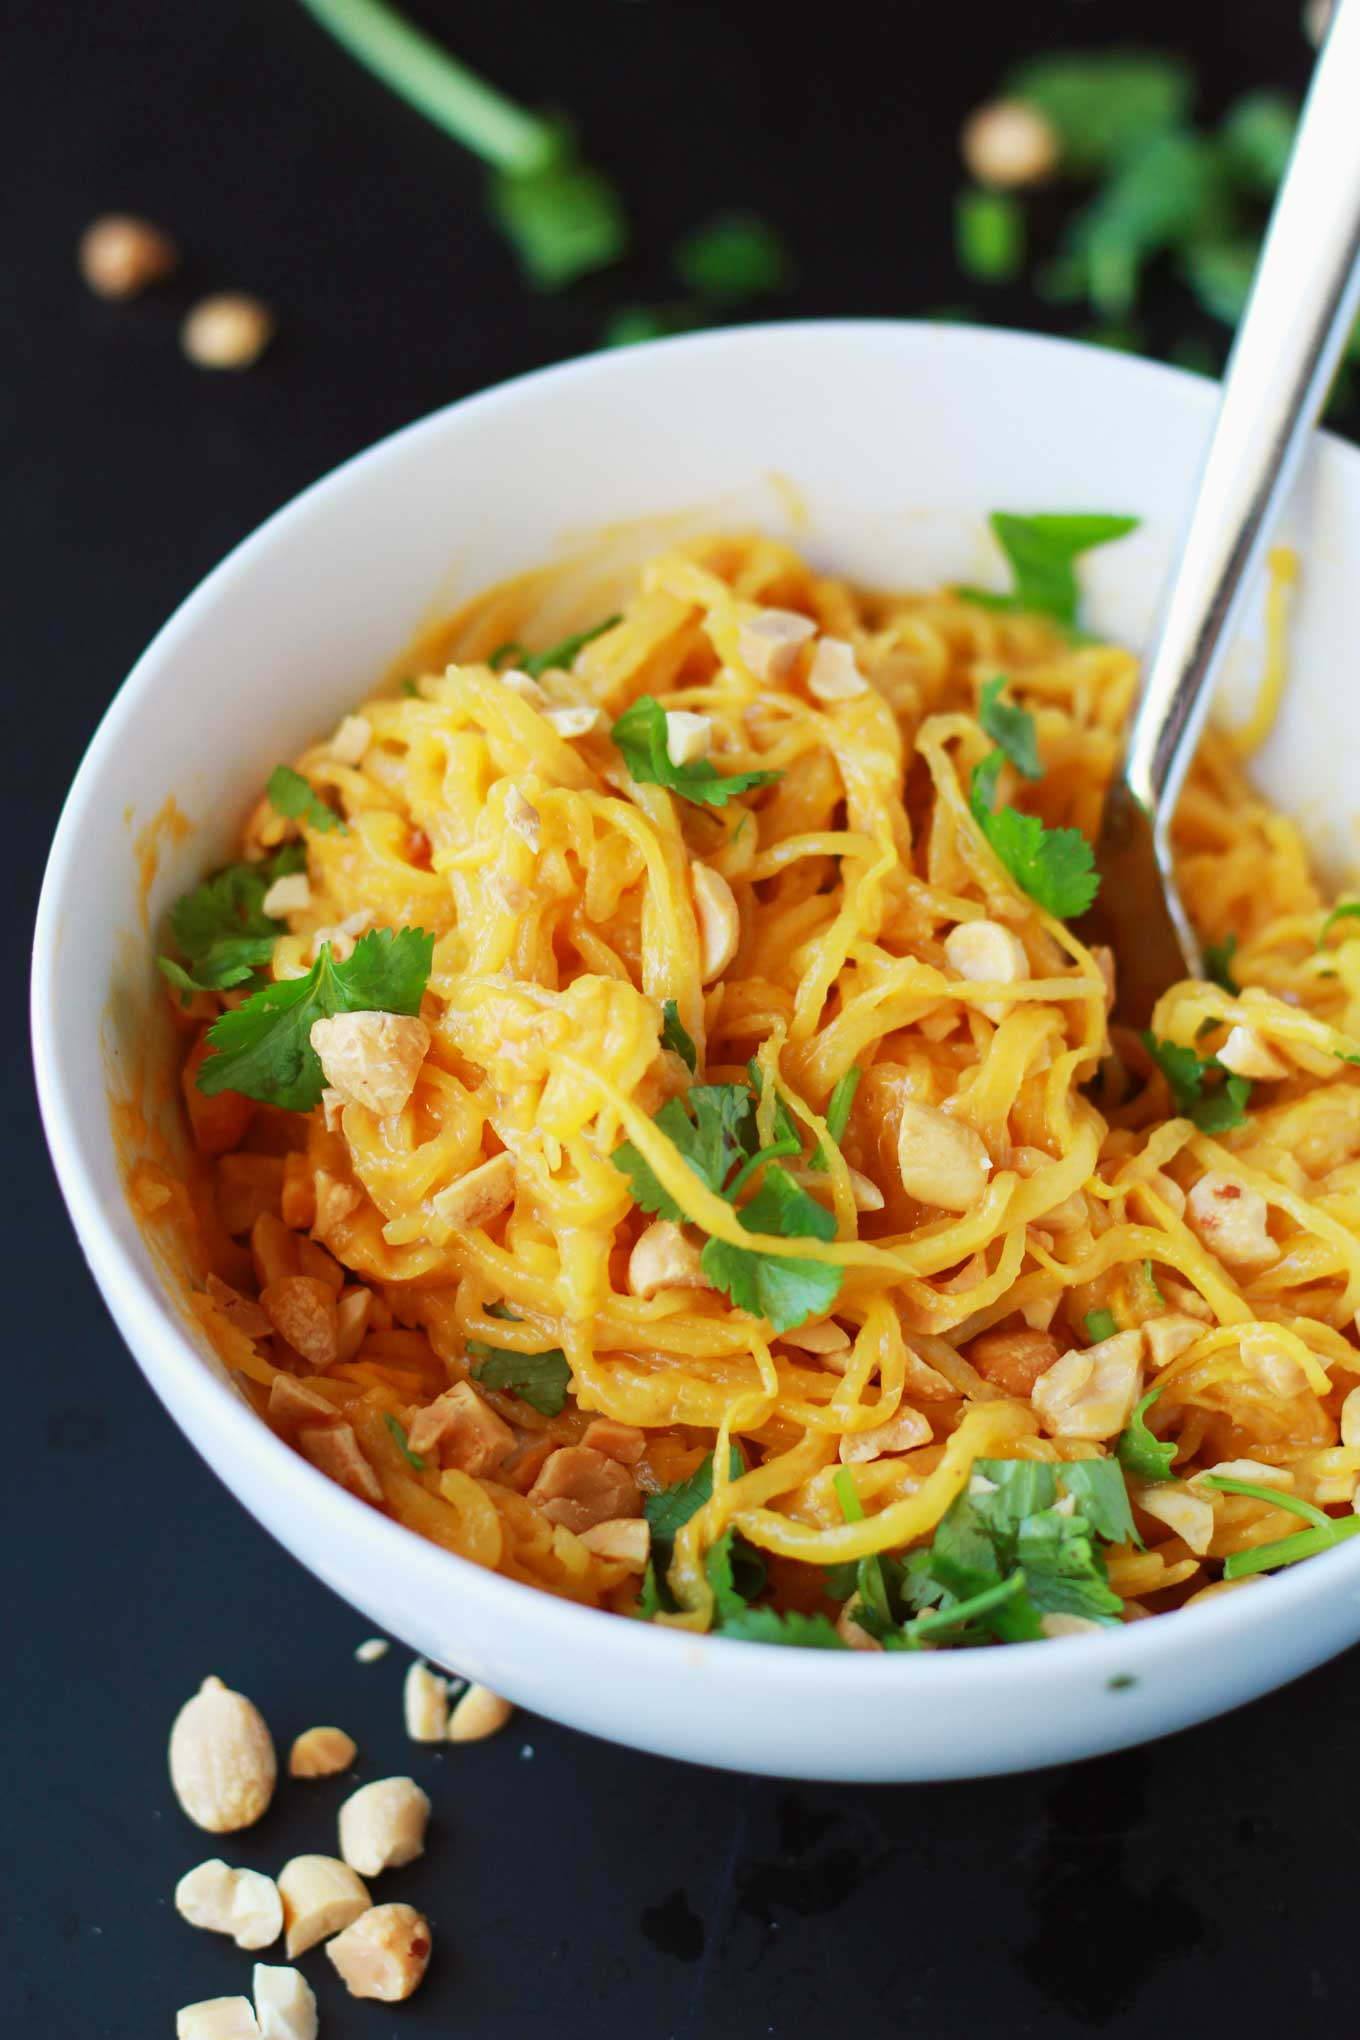 Spaghetti Squash Peanut Noodles | Vegan | Plant-based | WFPB | Gluten-free | Oil-Free | Recipe | https://passtheplants.com/